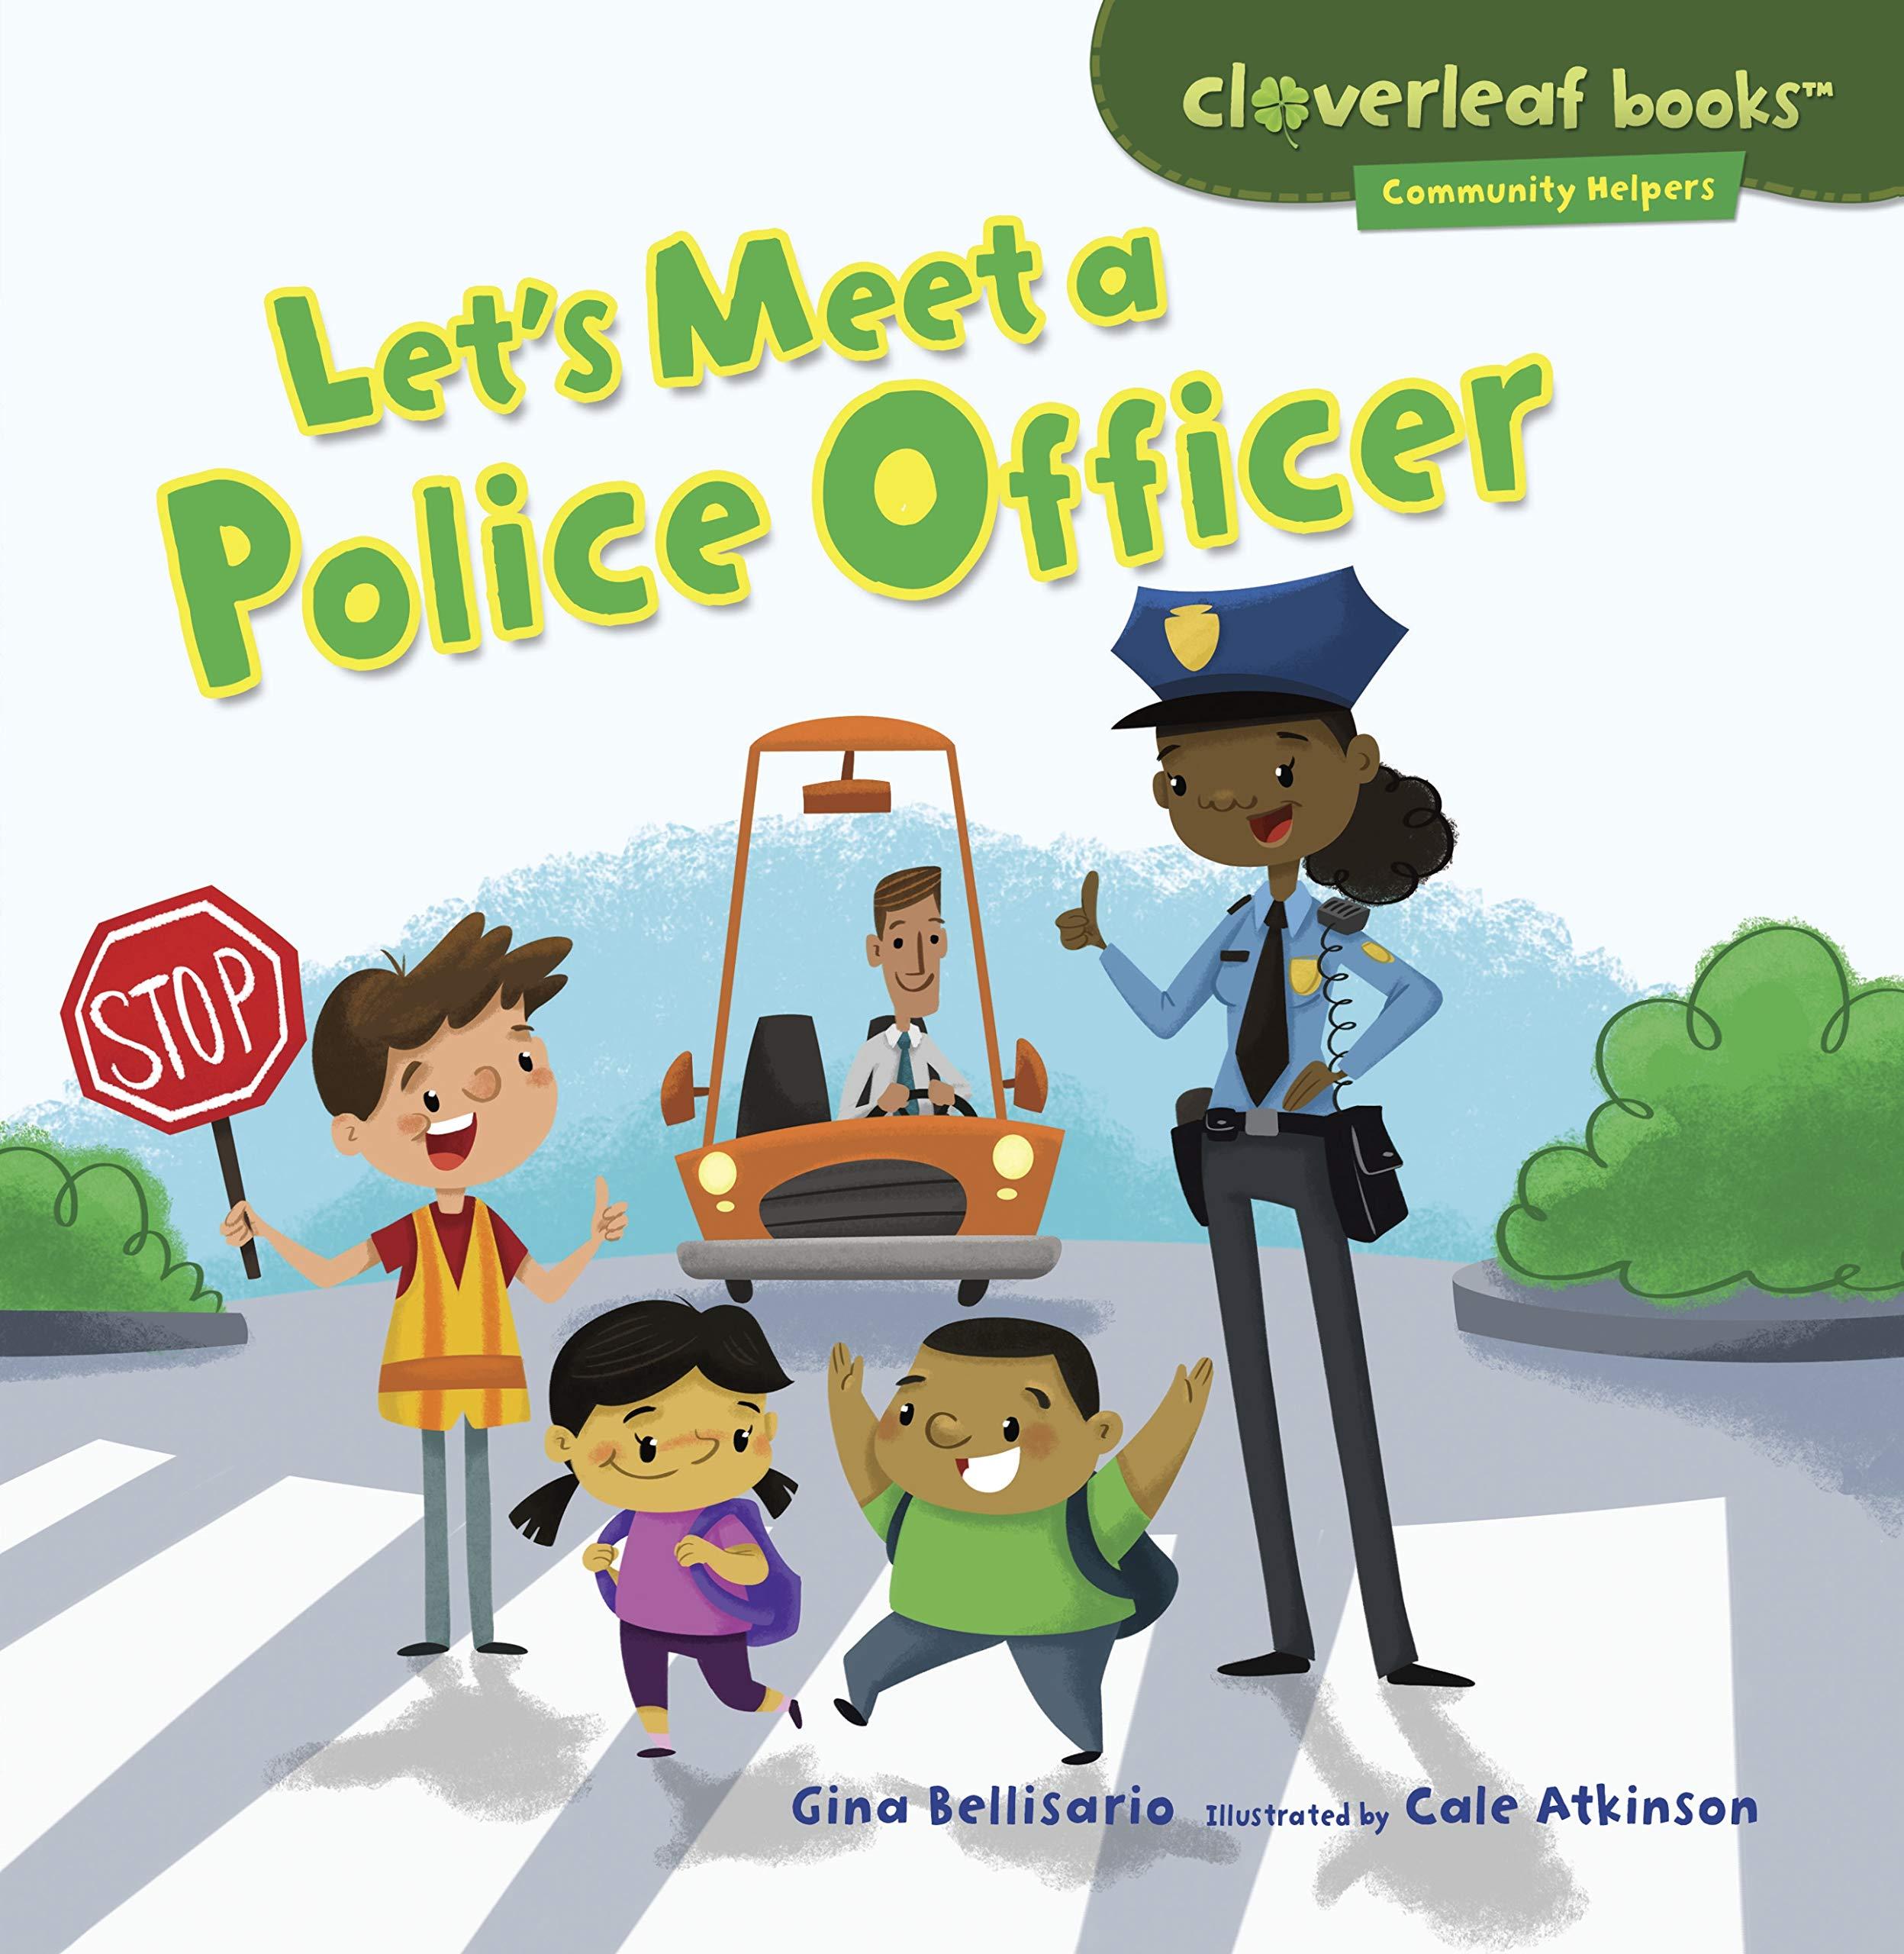 Download Let's Meet a Police Officer (Cloverleaf Books - Community Helpers) PDF